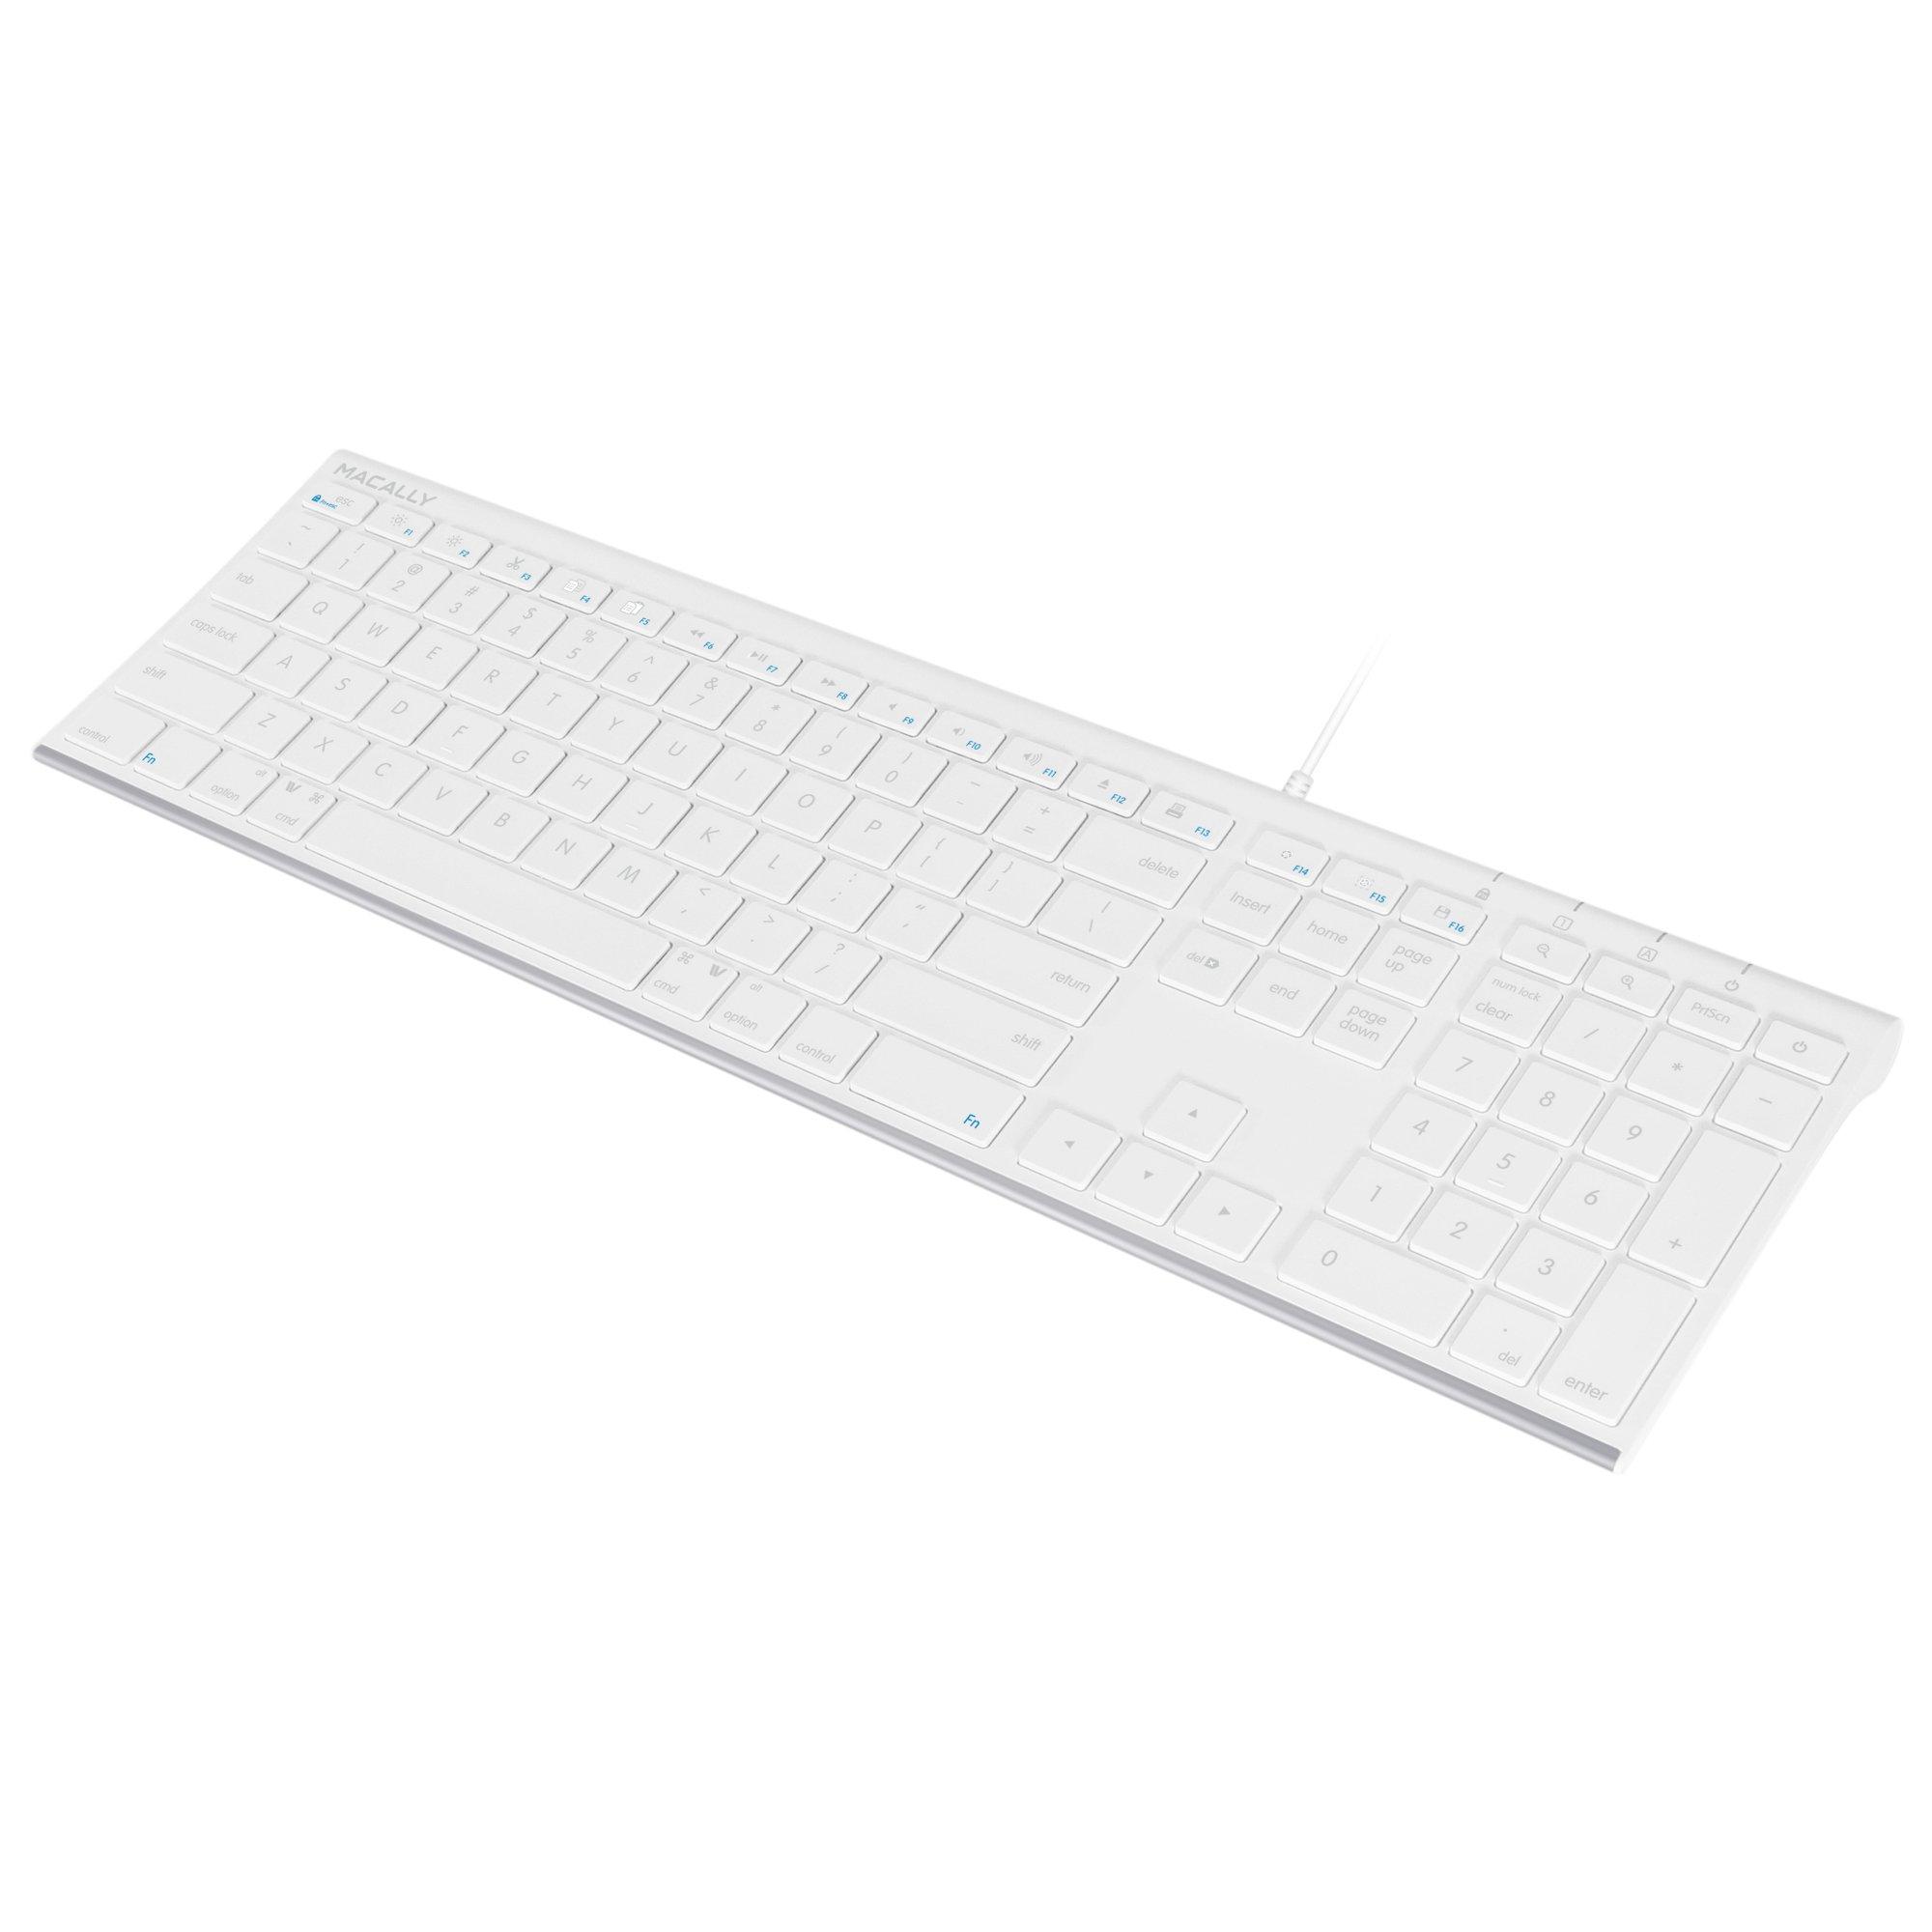 Macally Ultra-Slim USB Wired Computer Keyboard for Apple Mac Pro, MacBook Pro/Air, iMac, Mac Mini, Laptop, Windows PC Laptop (ACEKEY)